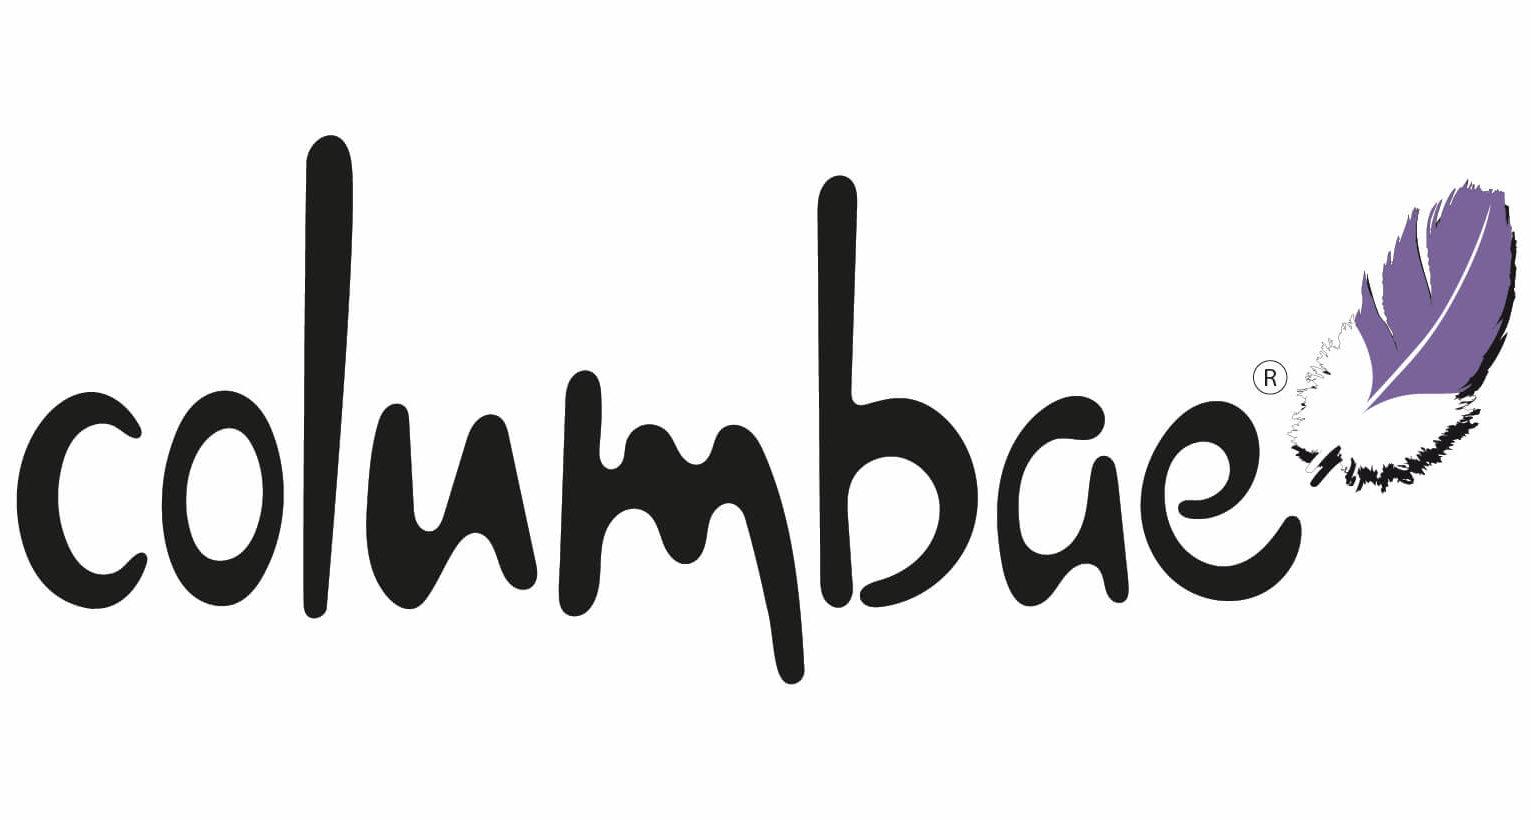 Columbae